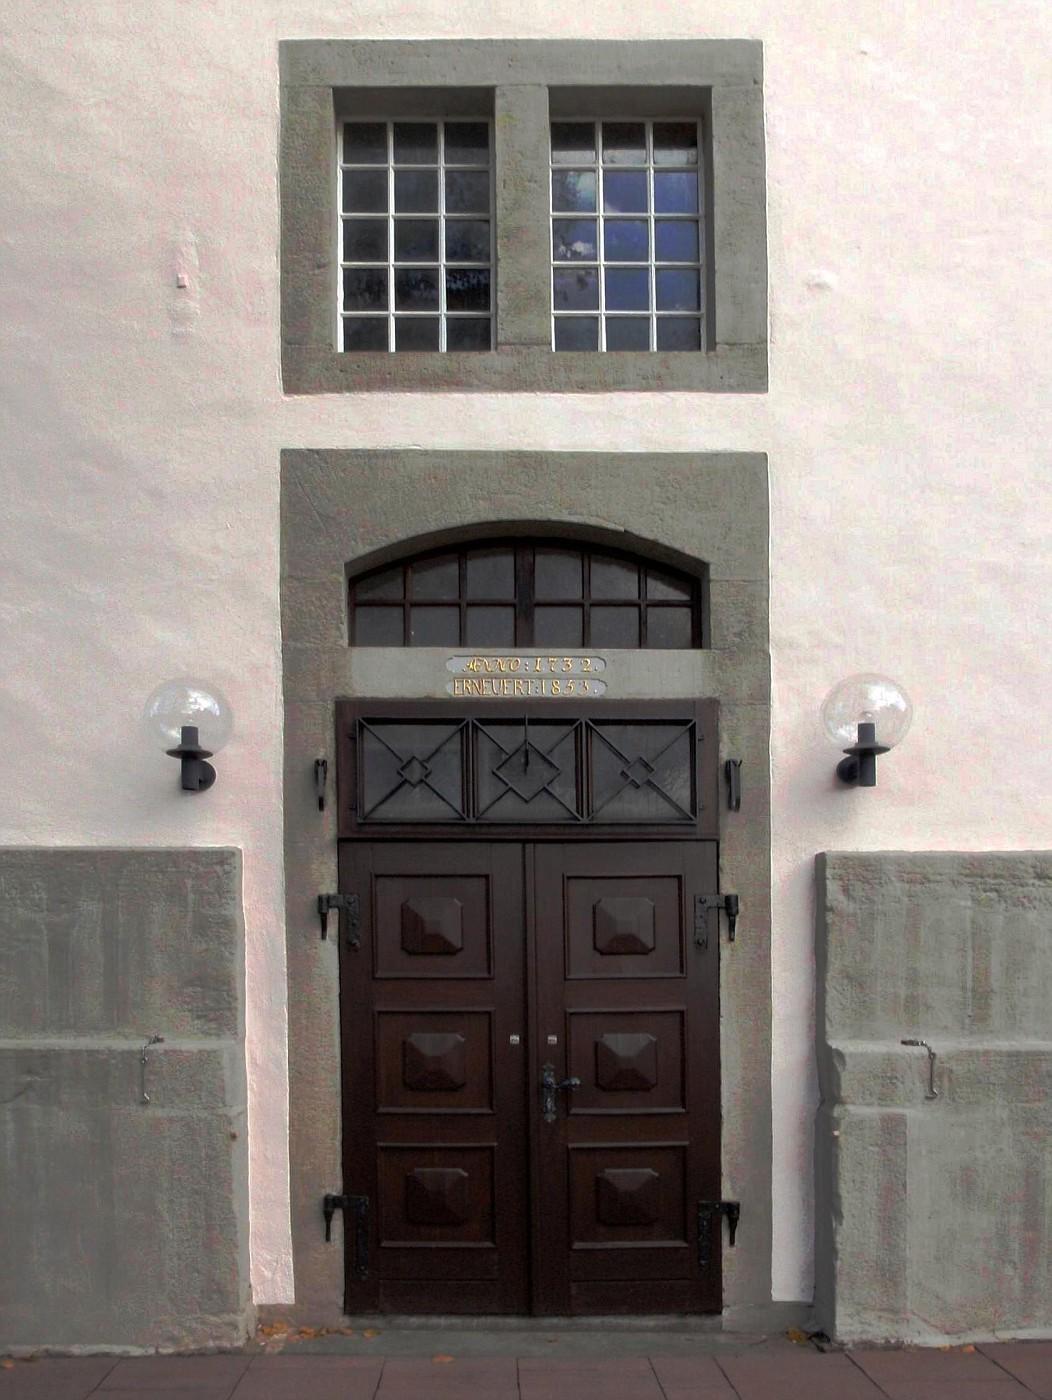 Eingang der Marienkirche